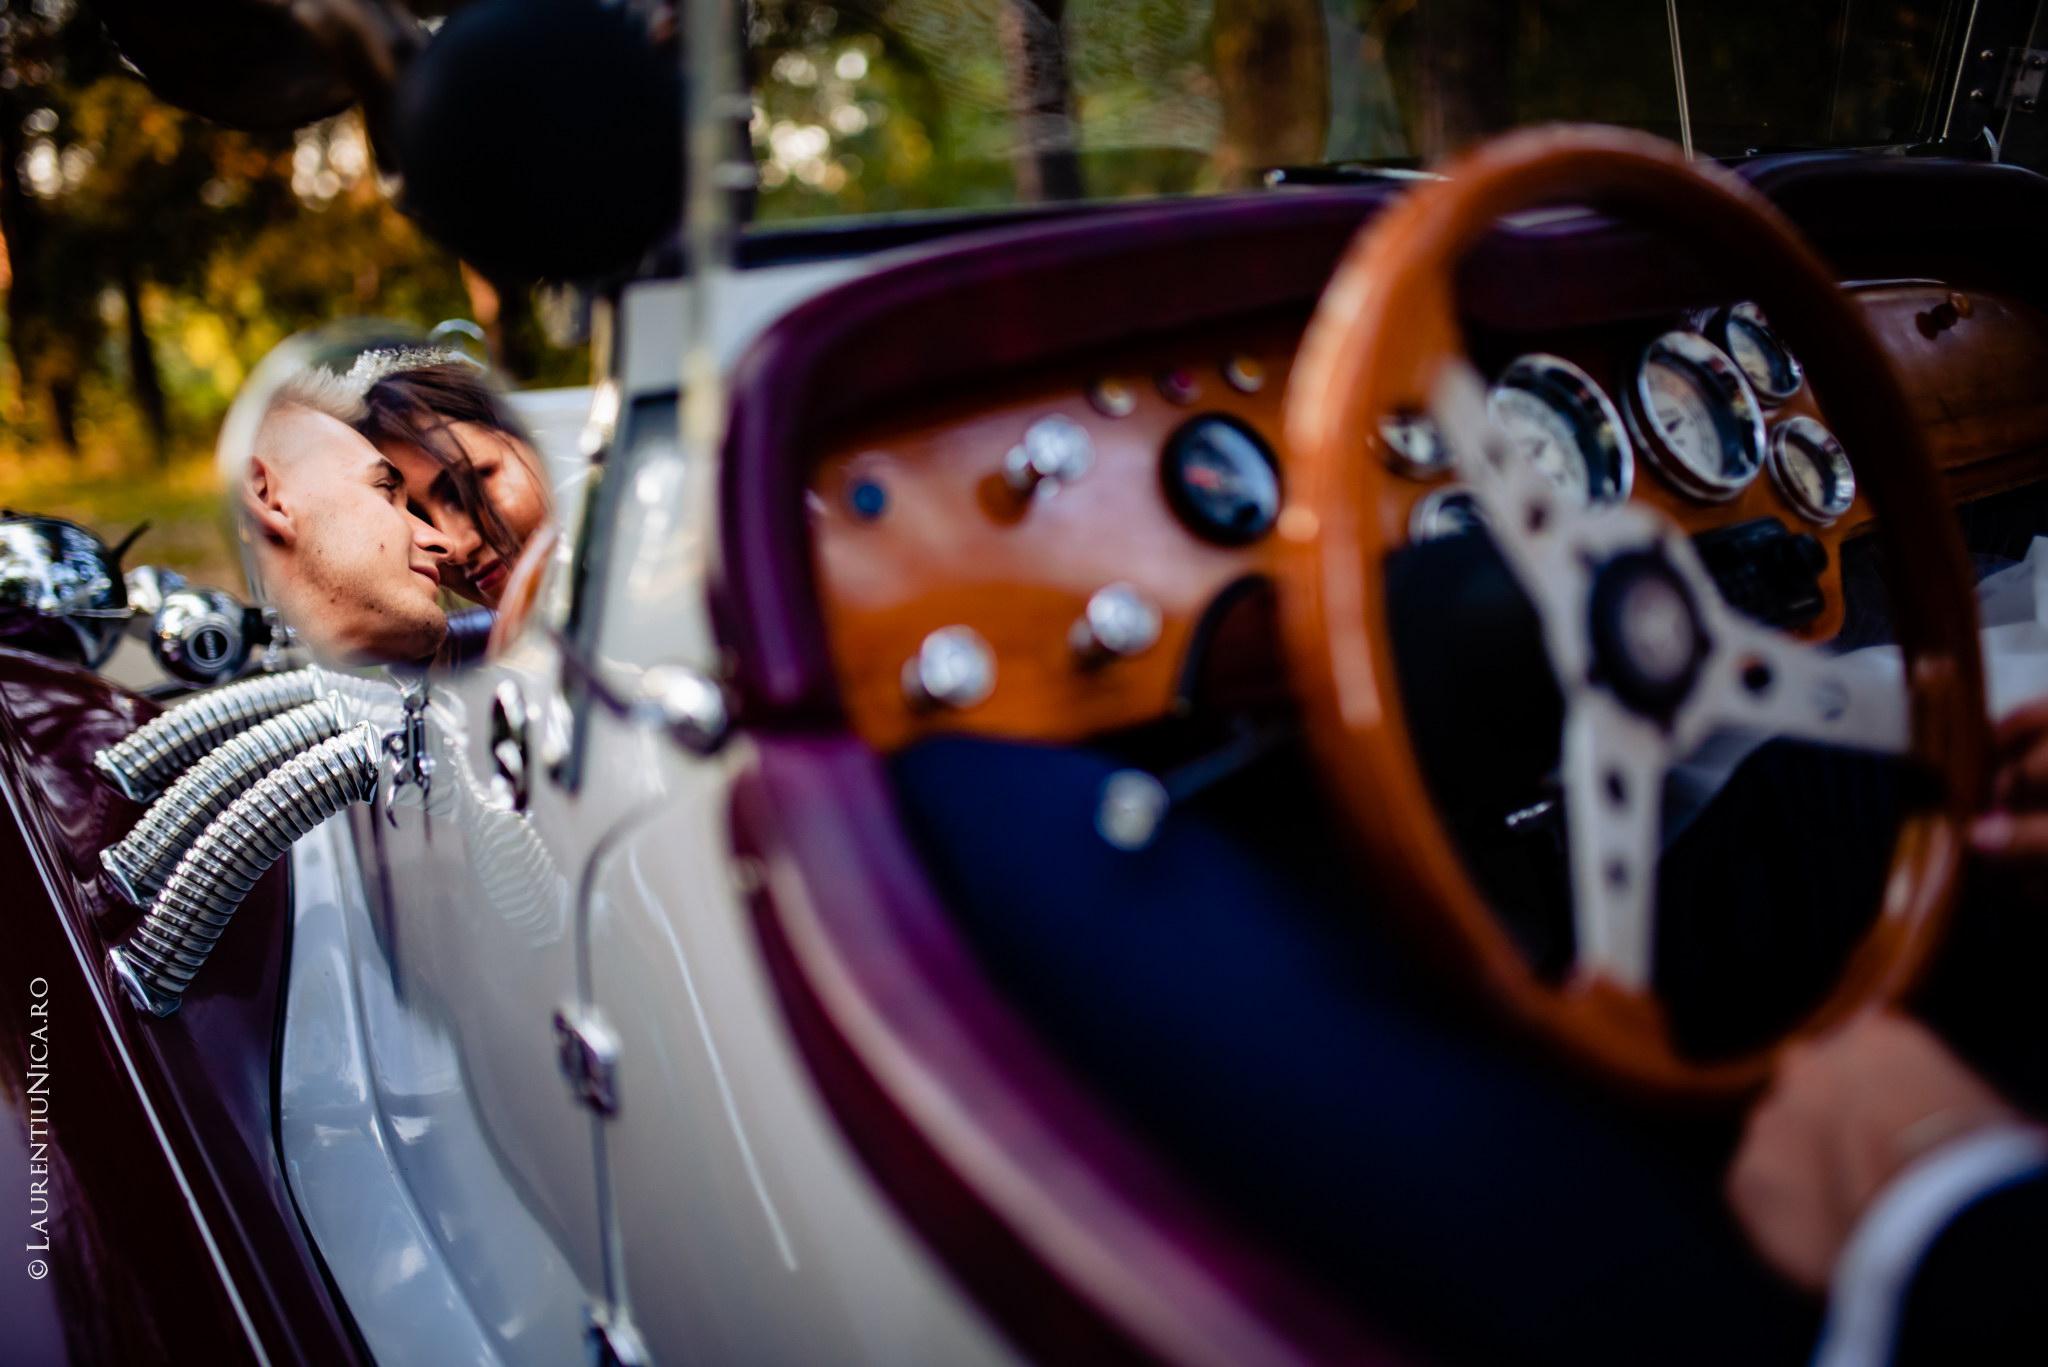 fotografii nunta Roxana si Cosmin fotograf nunta laurentiu nica 29 - Roxana & Cosmin | Fotografii nunta | Ticleni, judetul Gorj